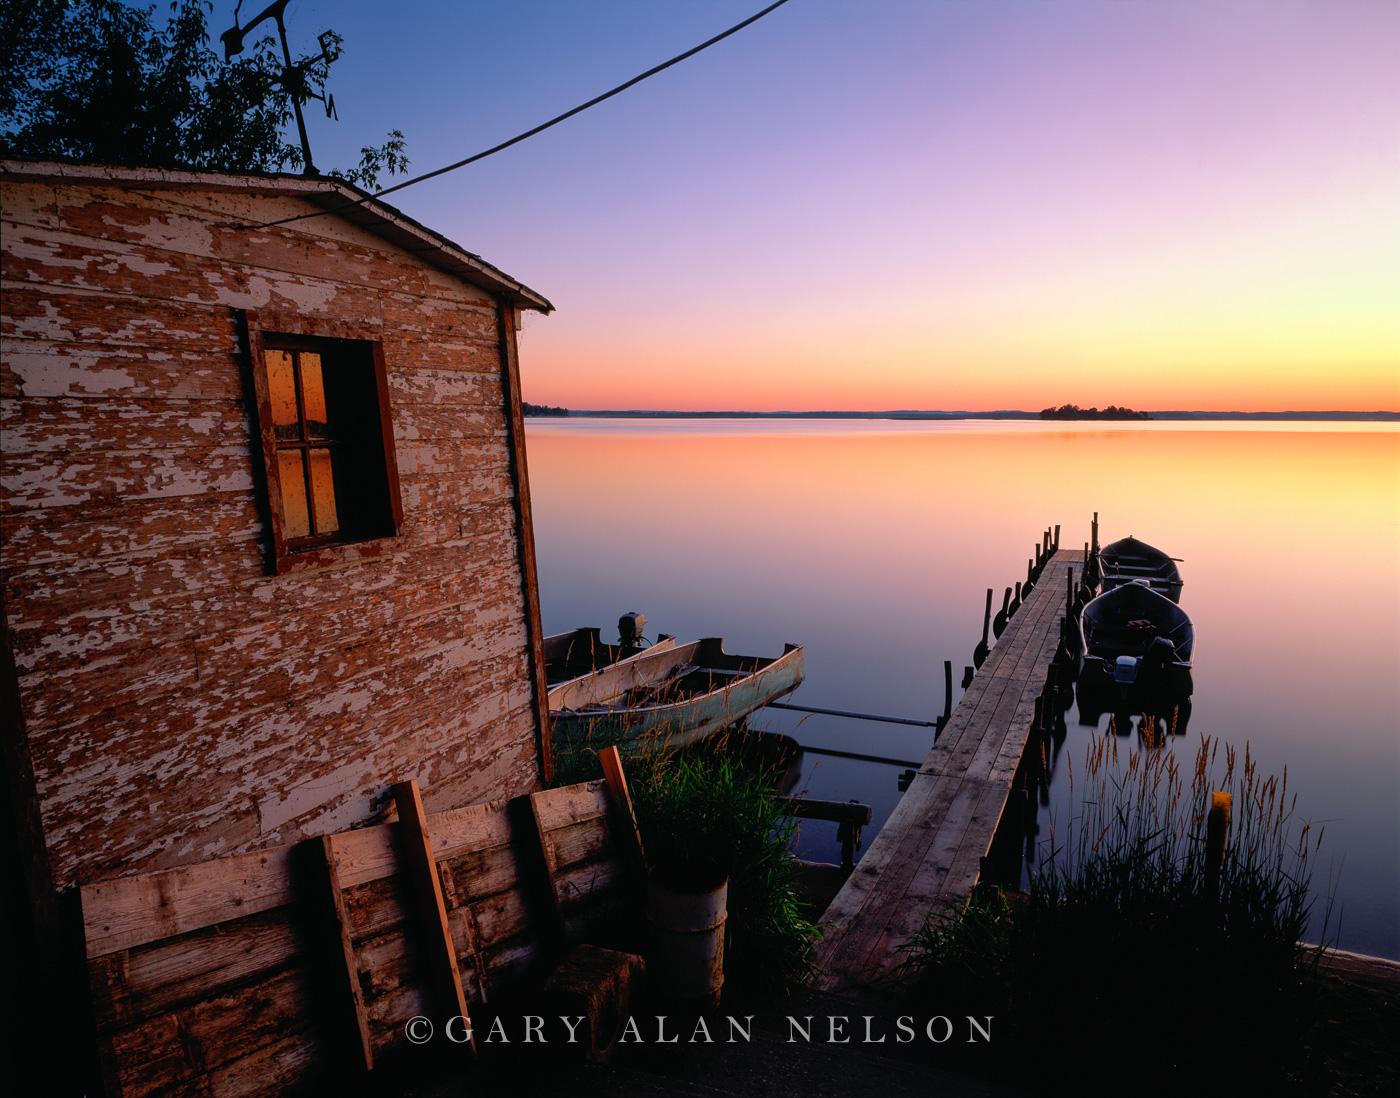 Boathouse and dock on Lake Lida, Otter Tail County, Minnesota